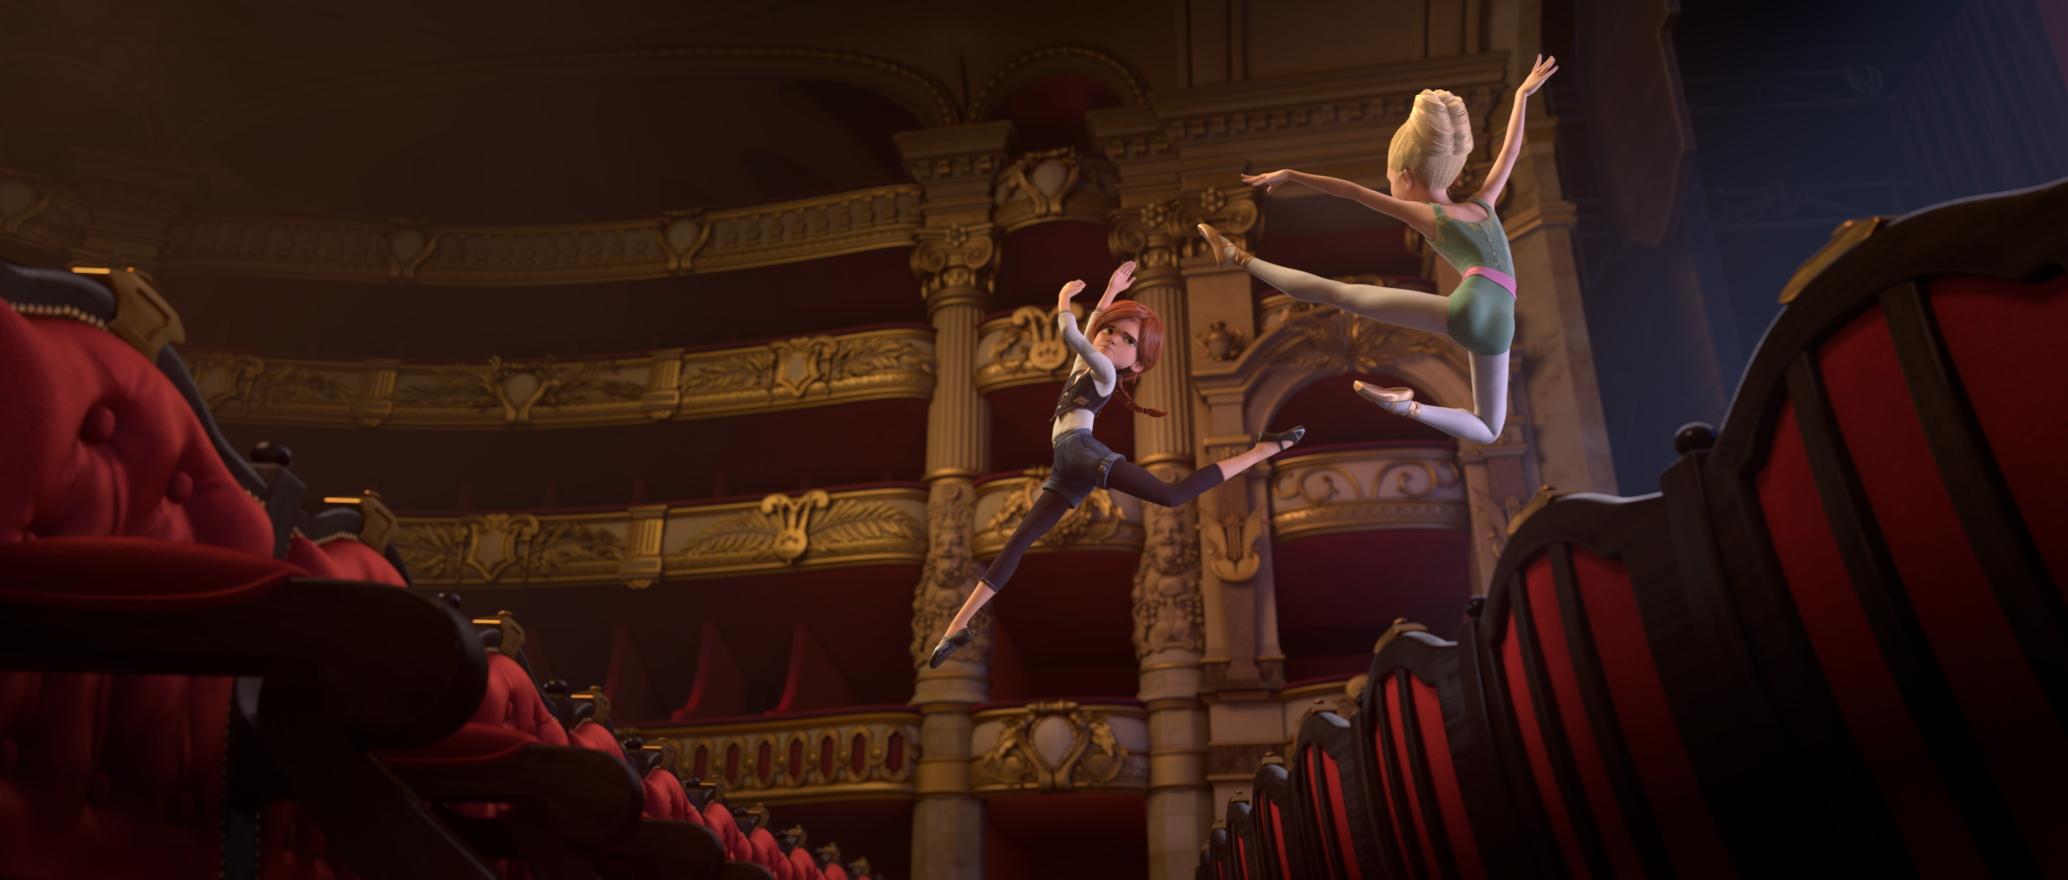 ballerinathemovie06.jpg